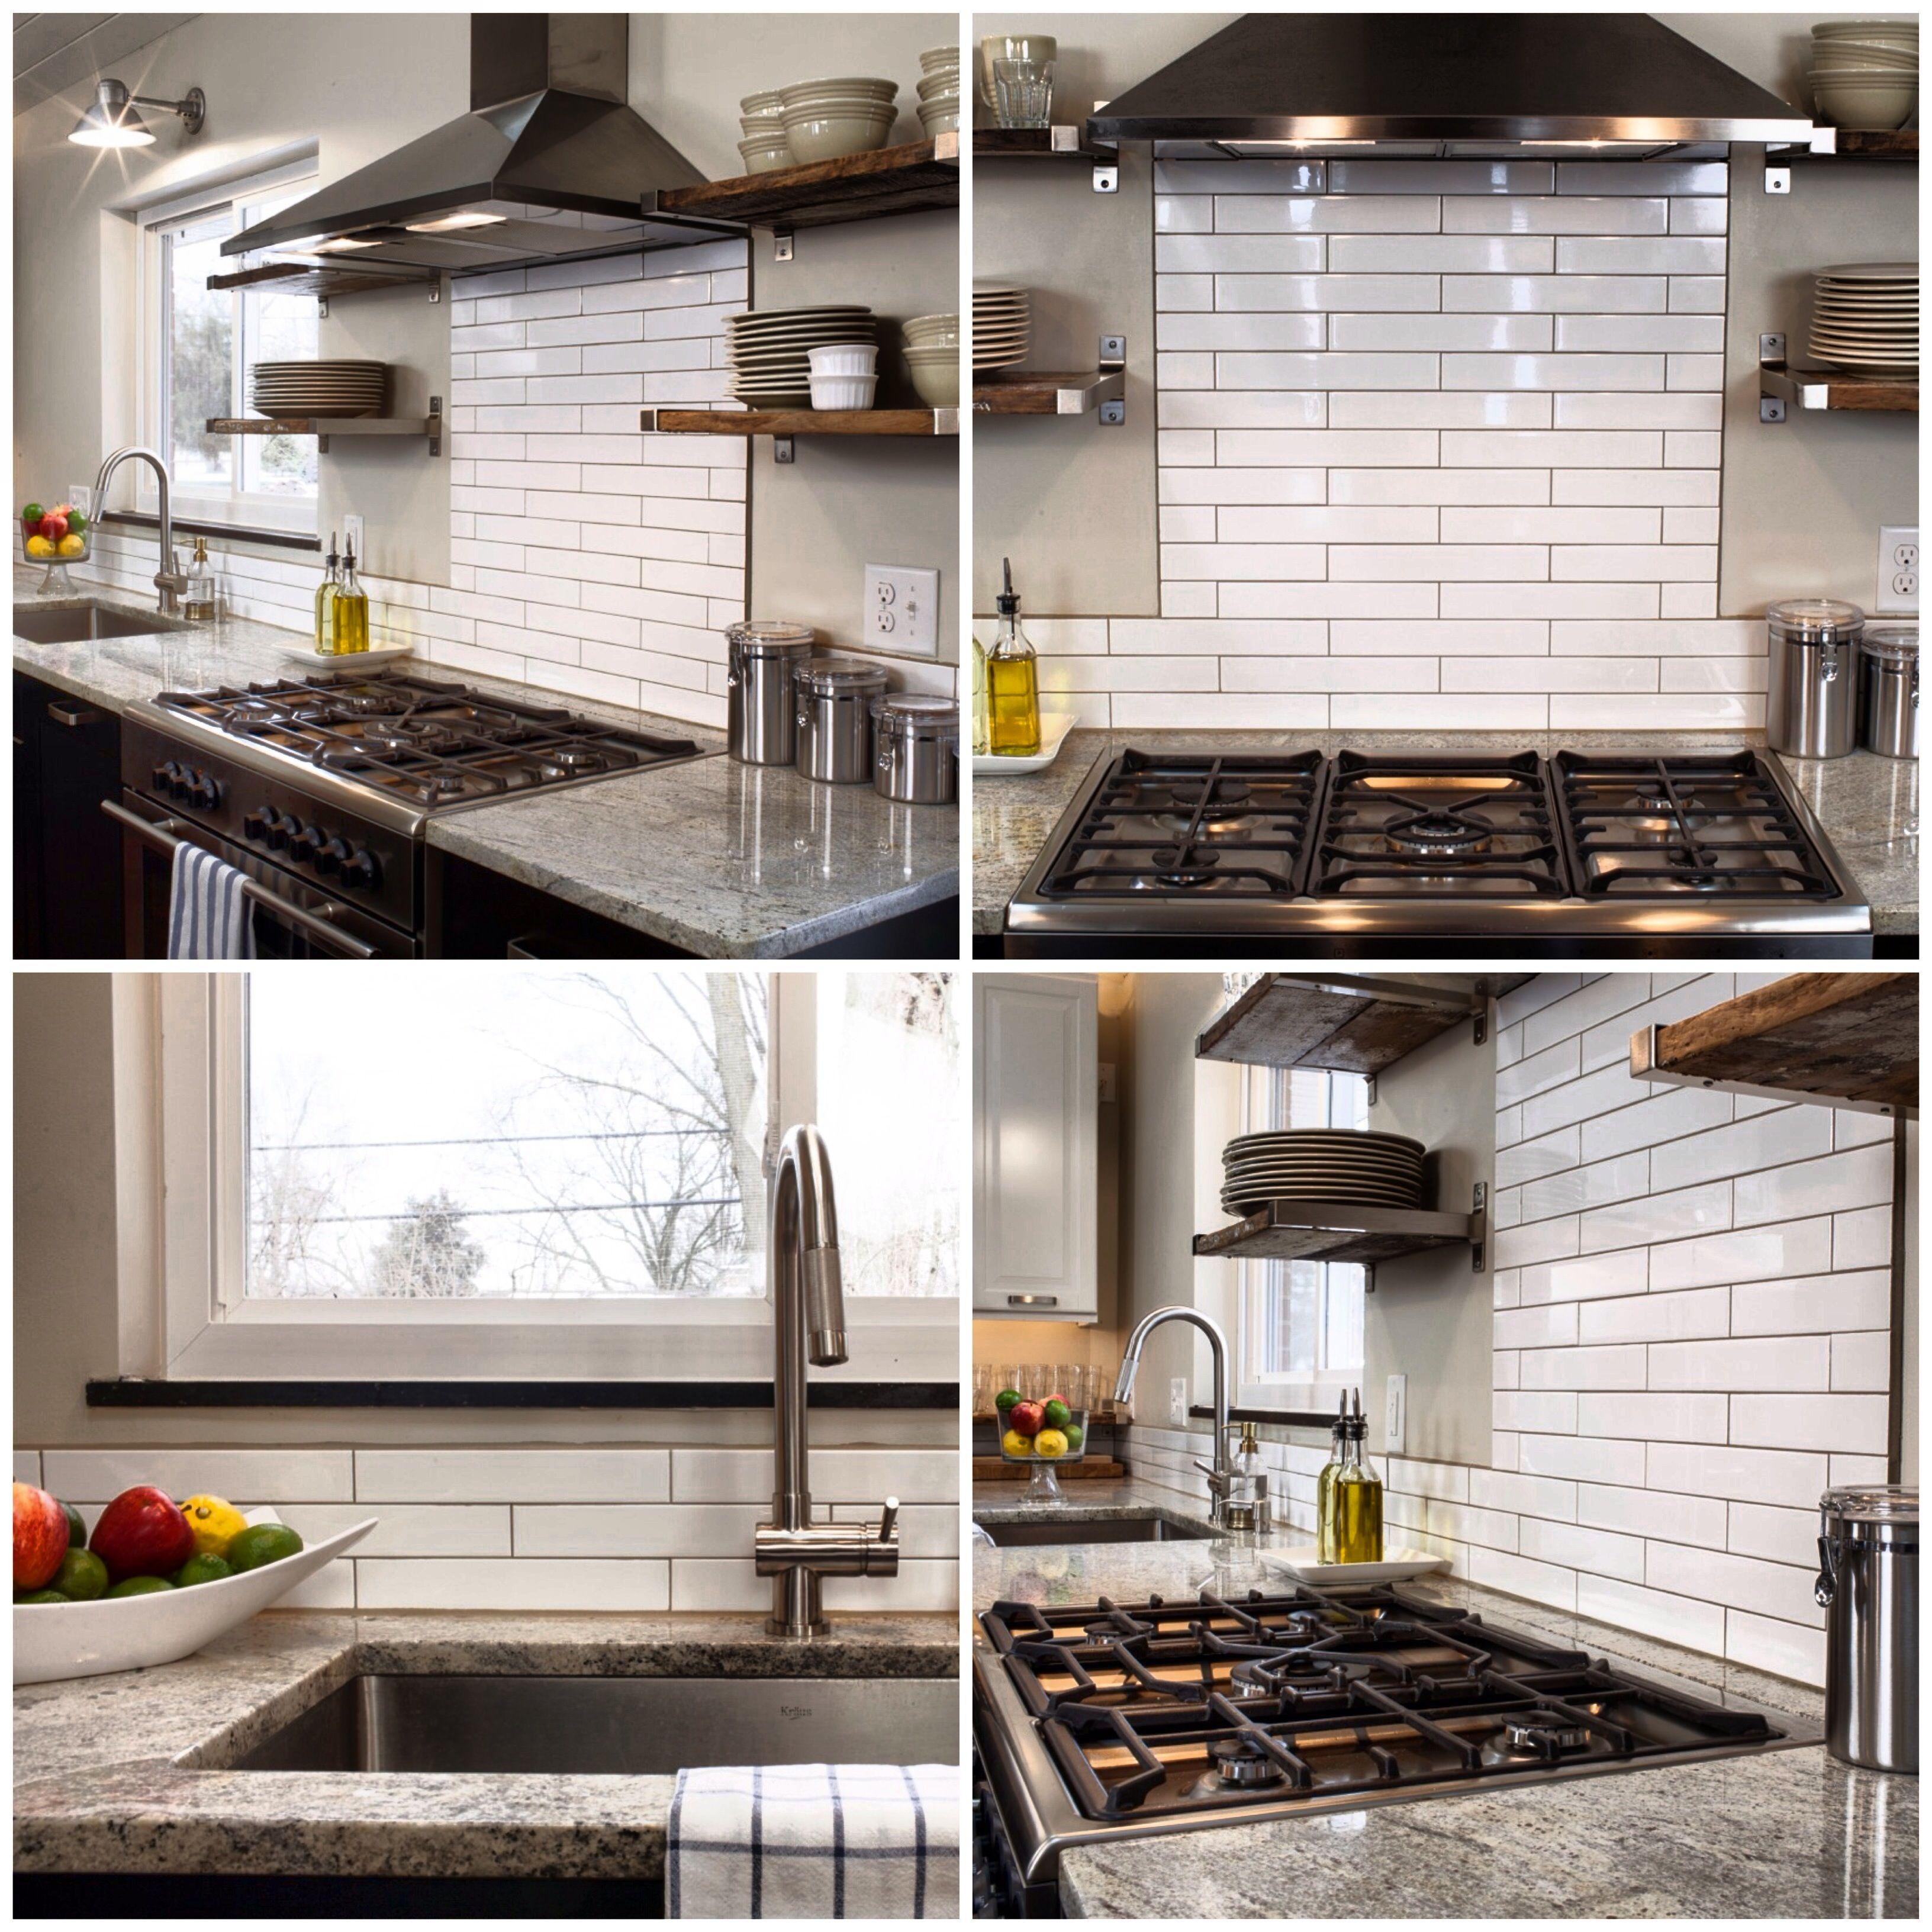 Housetweakings updated kitchen backsplash  Your